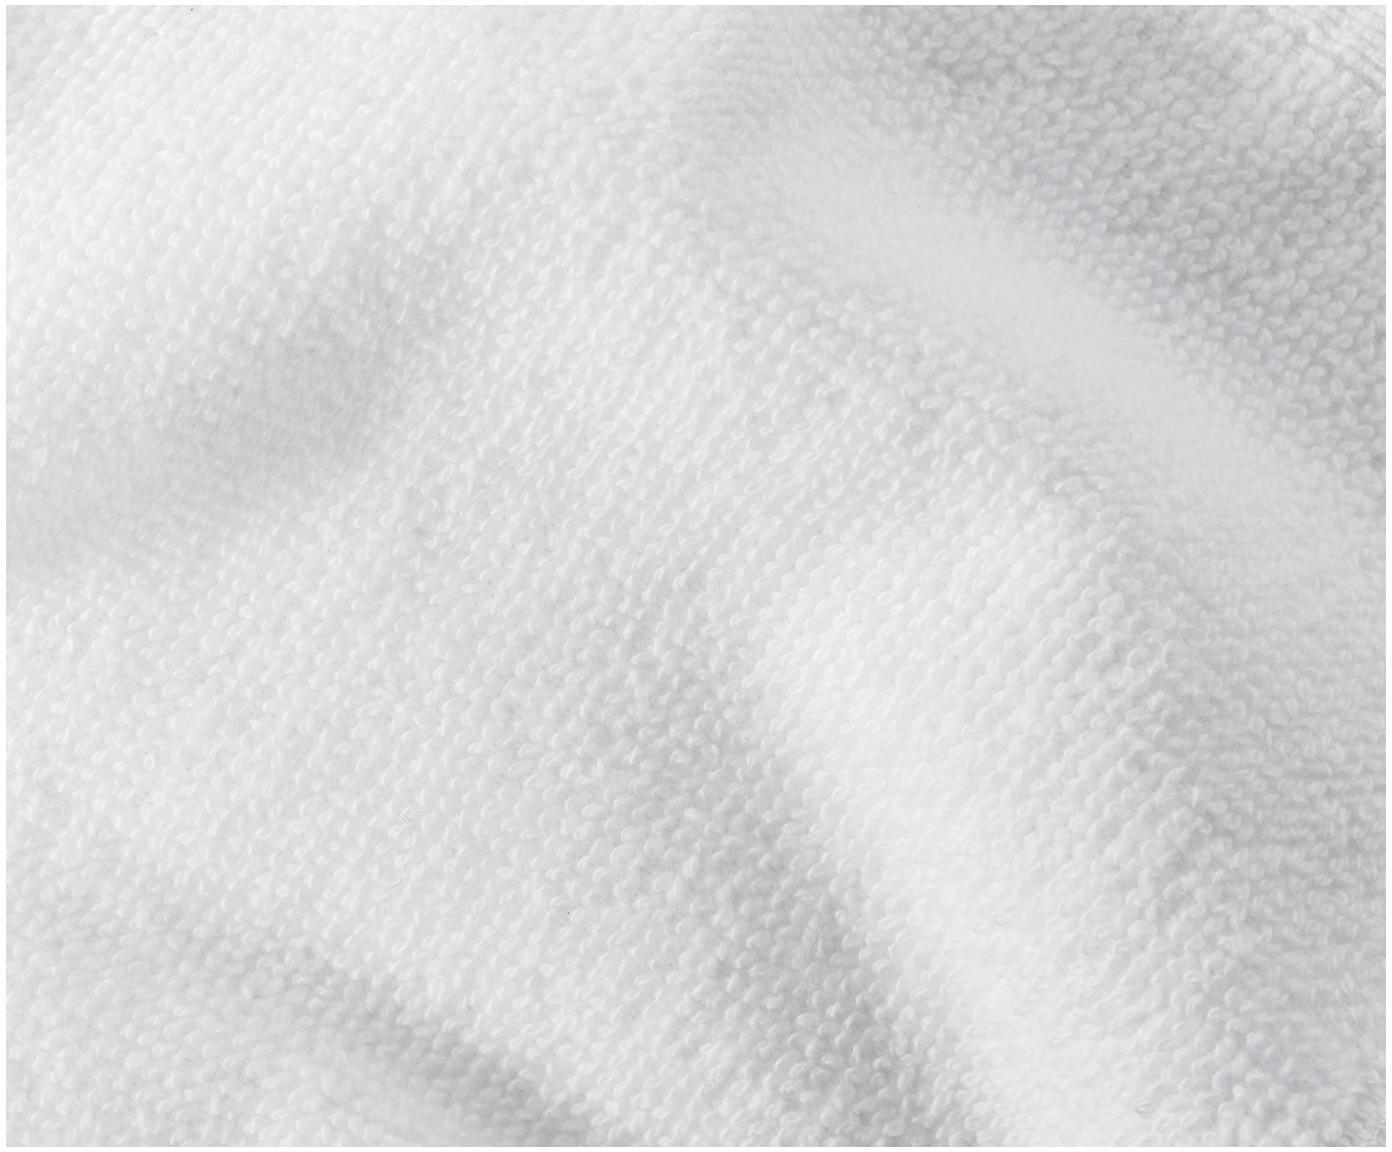 Set de toallas Premium, 3pzas., 100%algodón Gramaje superior 600g/m², Blanco, Tamaños diferentes